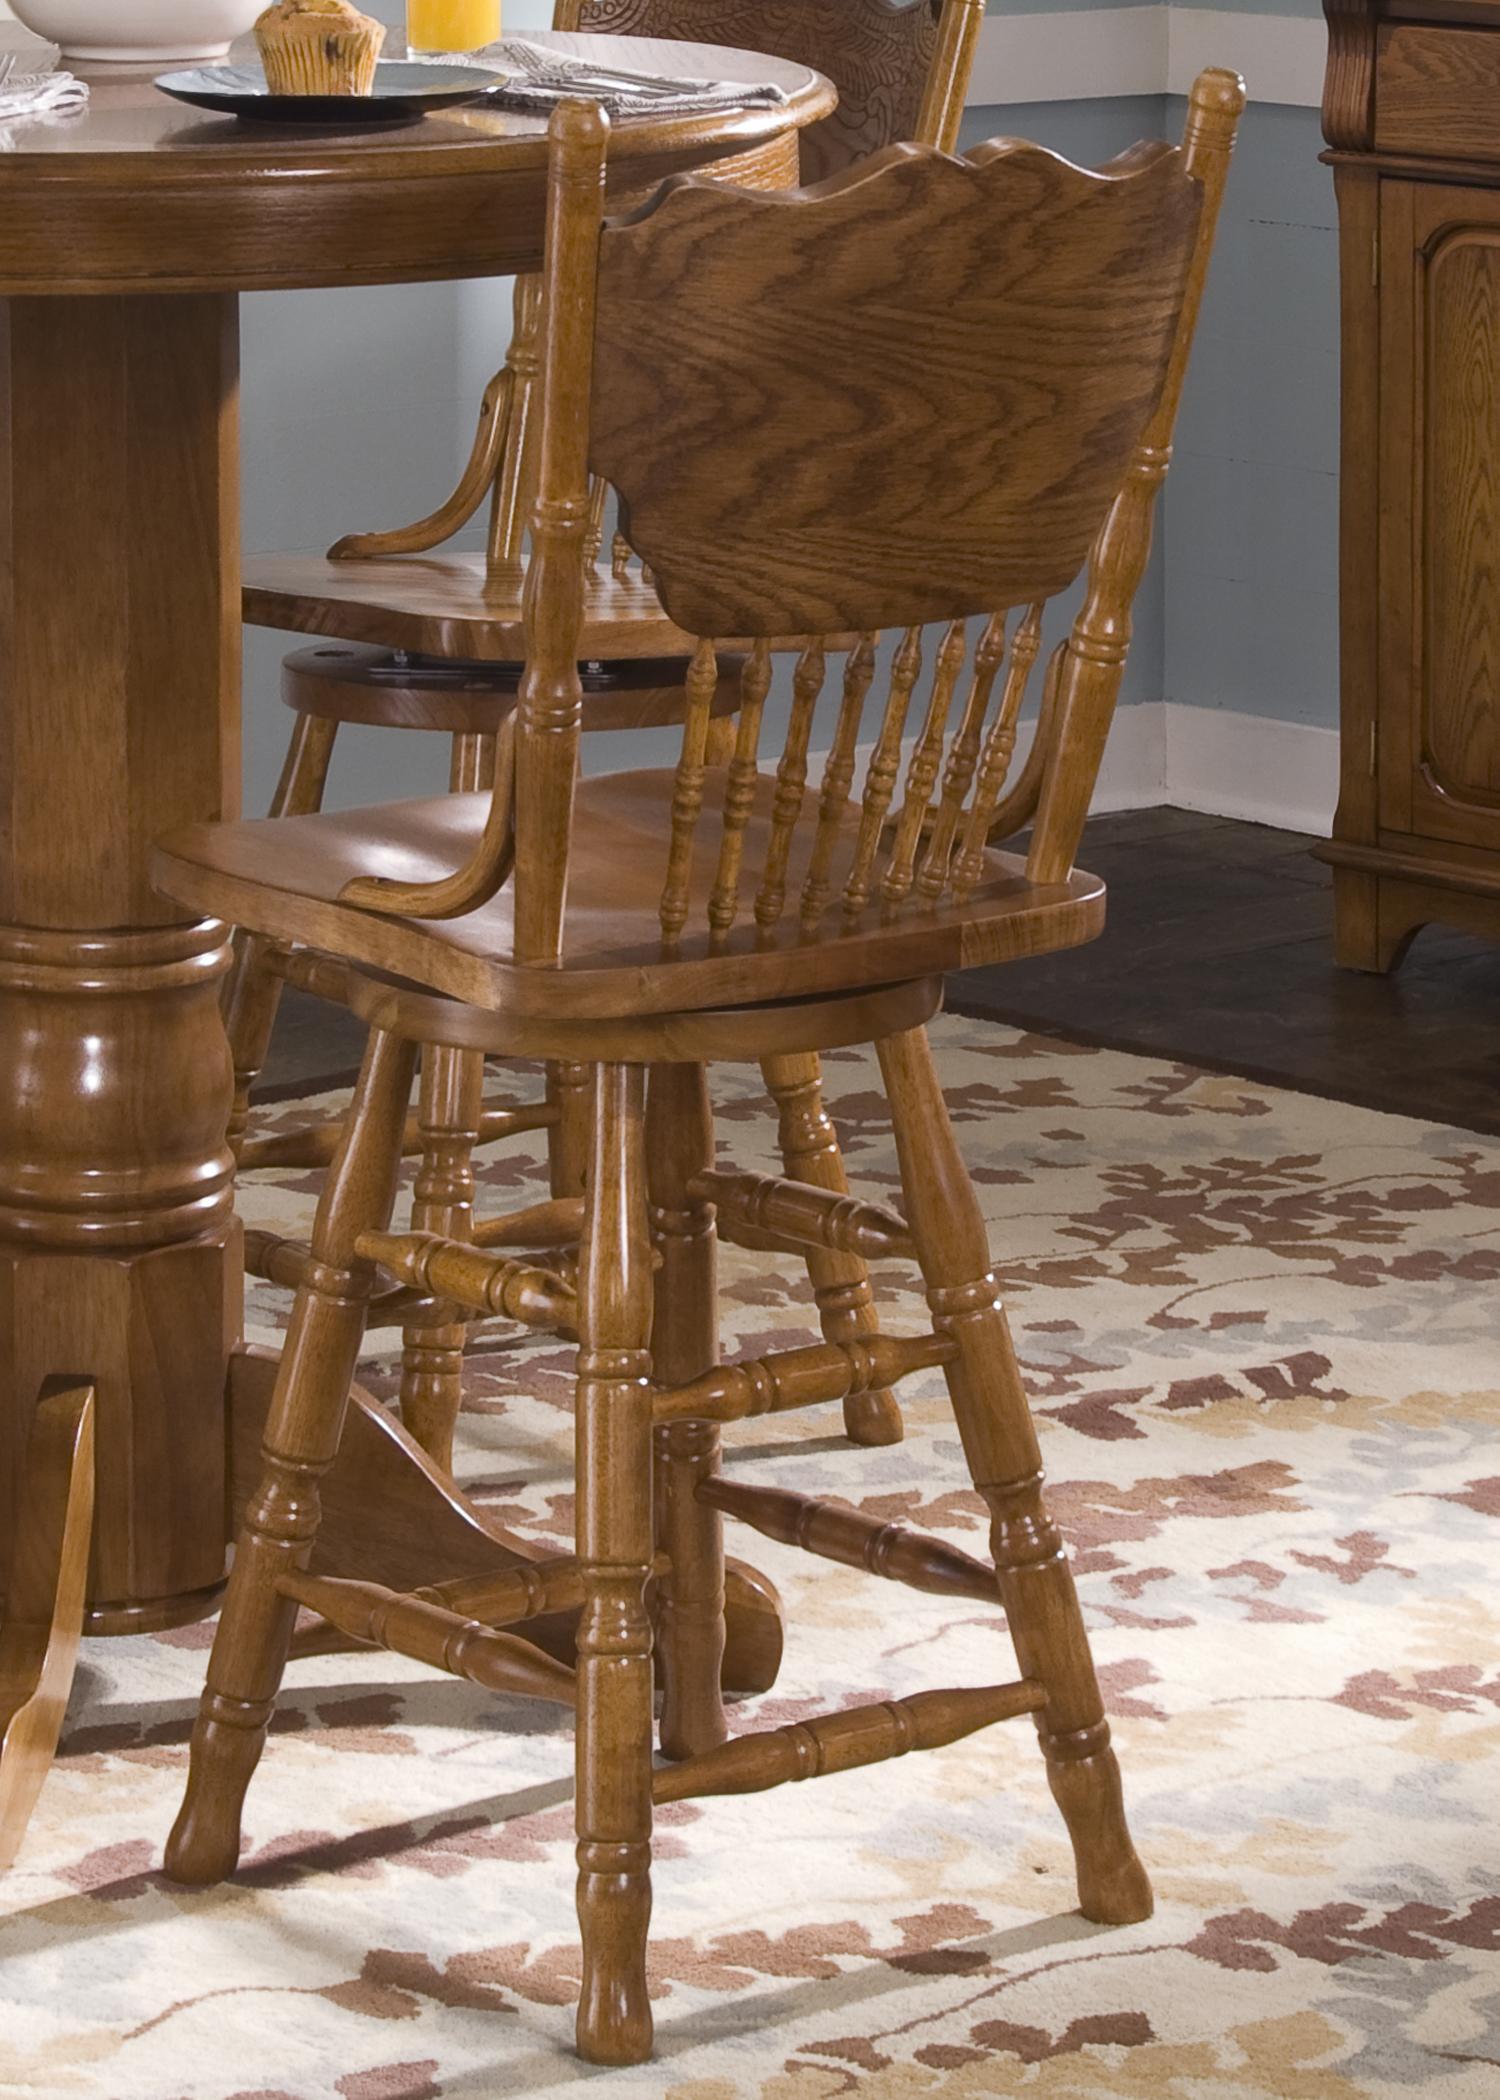 Liberty Furniture Nostalgia Mission 24 Inch Press Back Barstool